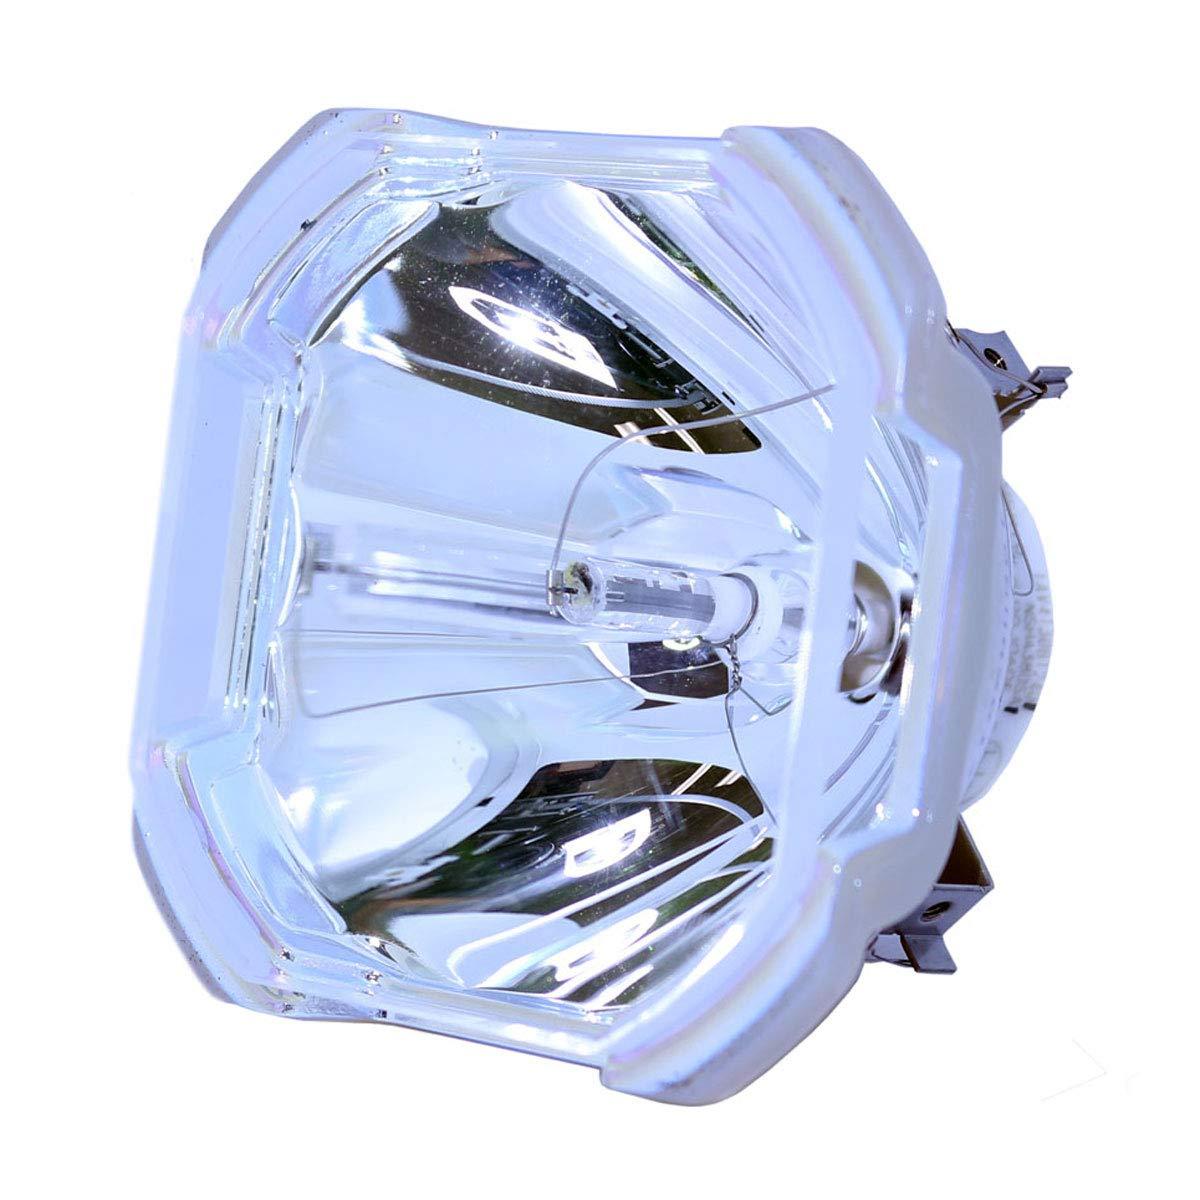 SpArc 交換用ランプ 囲い/電球付き Eiki POA-LMP147用 Platinum (Brighter/Durable) Platinum (Brighter/Durable) Lamp Only B07MPPSY1B